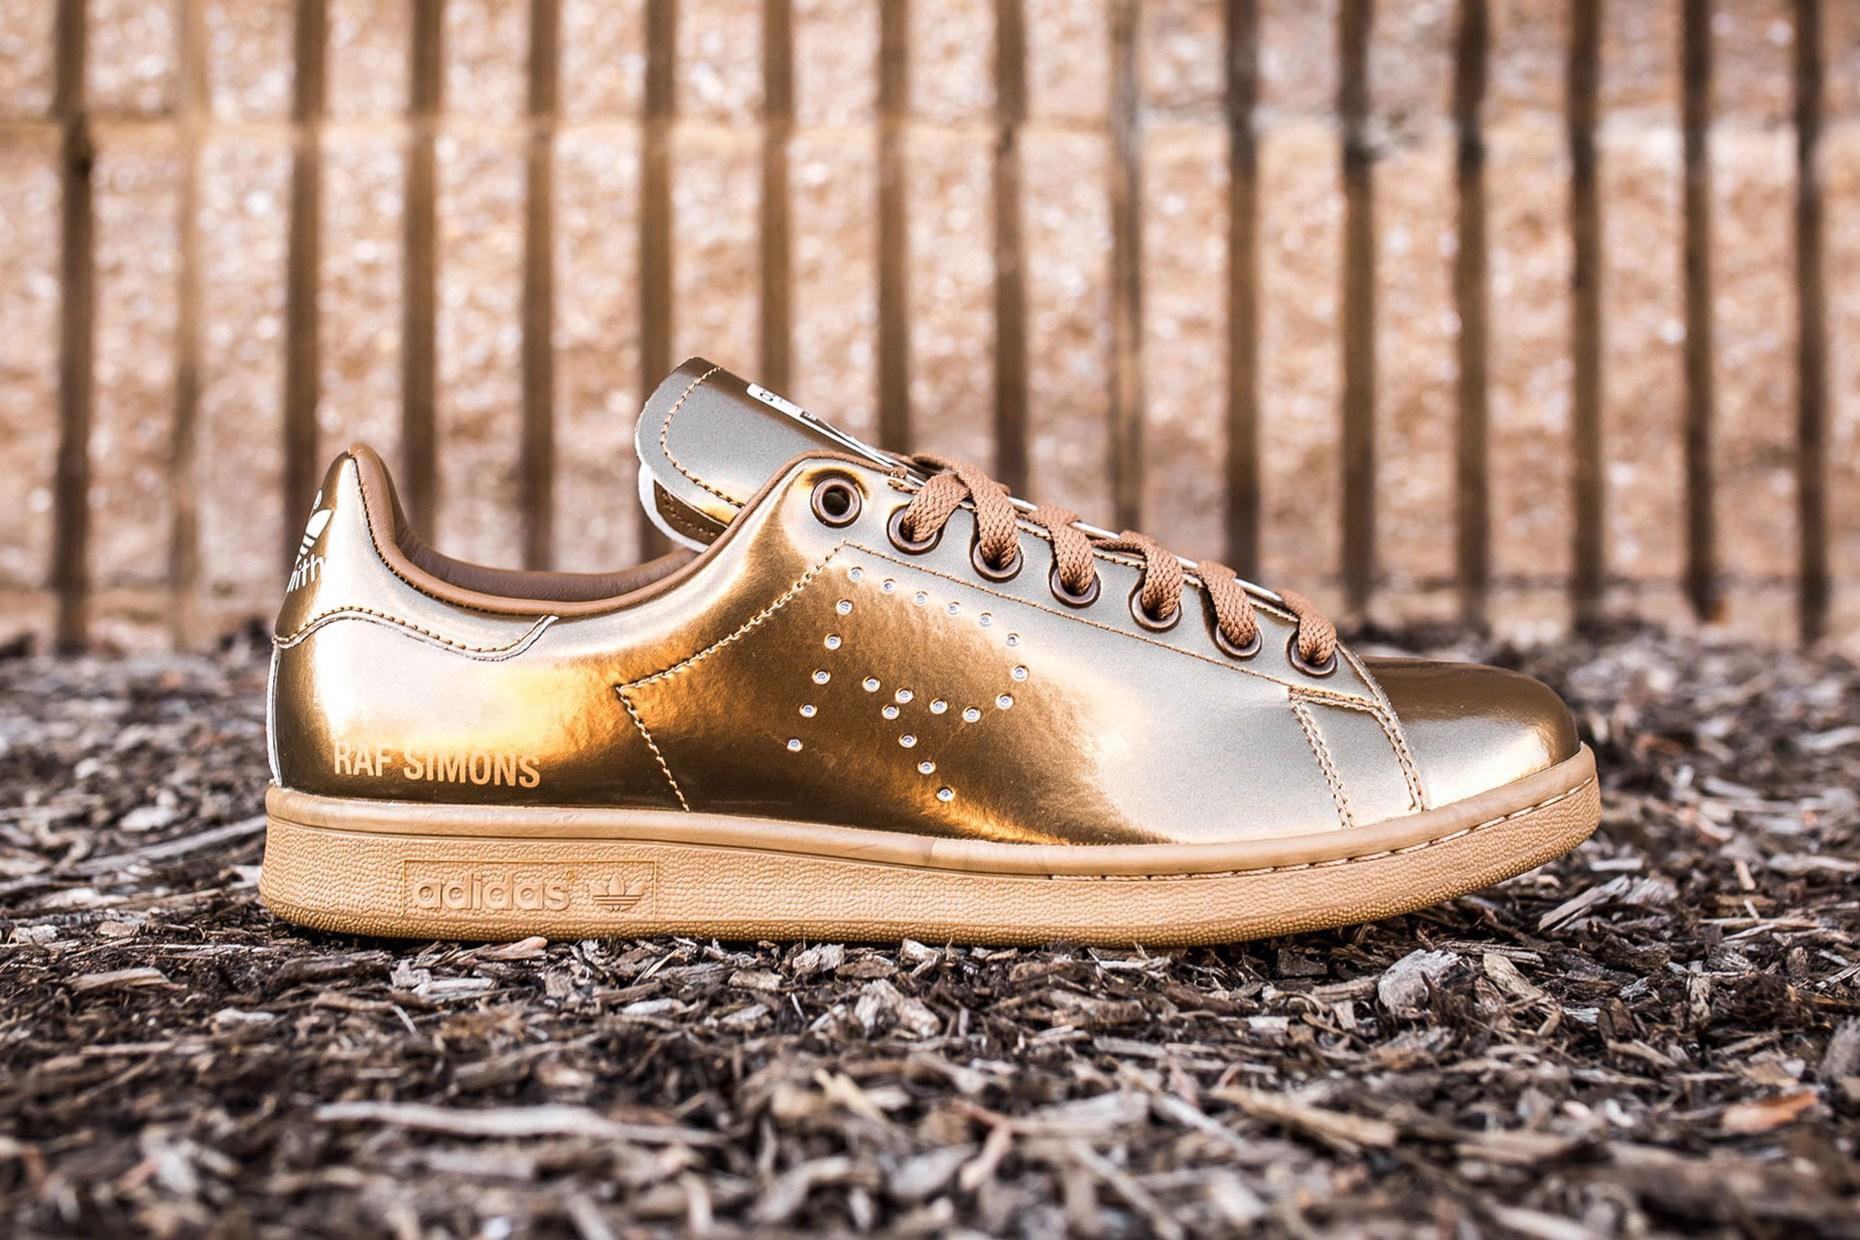 Raf Simons x stan smith: New 'Copper' Drop